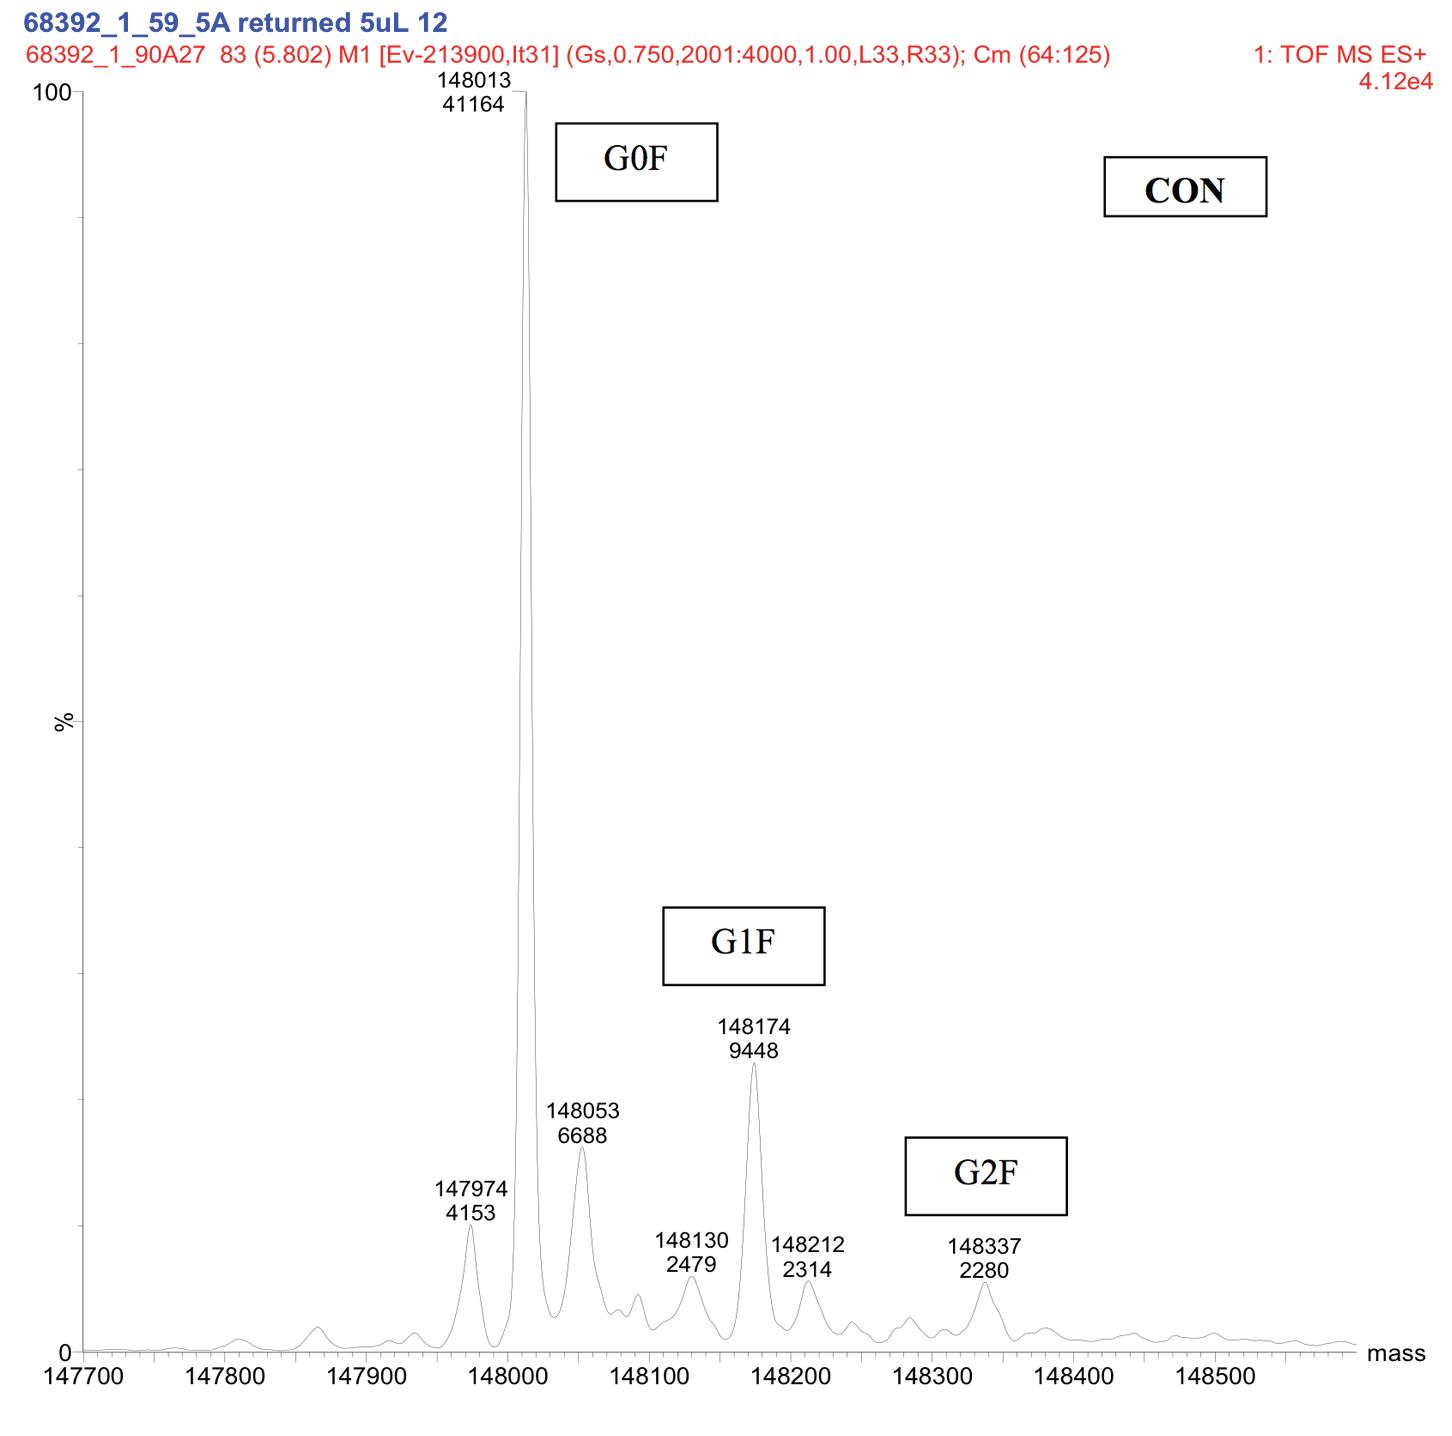 Figure 5. Representative Deconvoluted Mass Spectra of the Control Sample